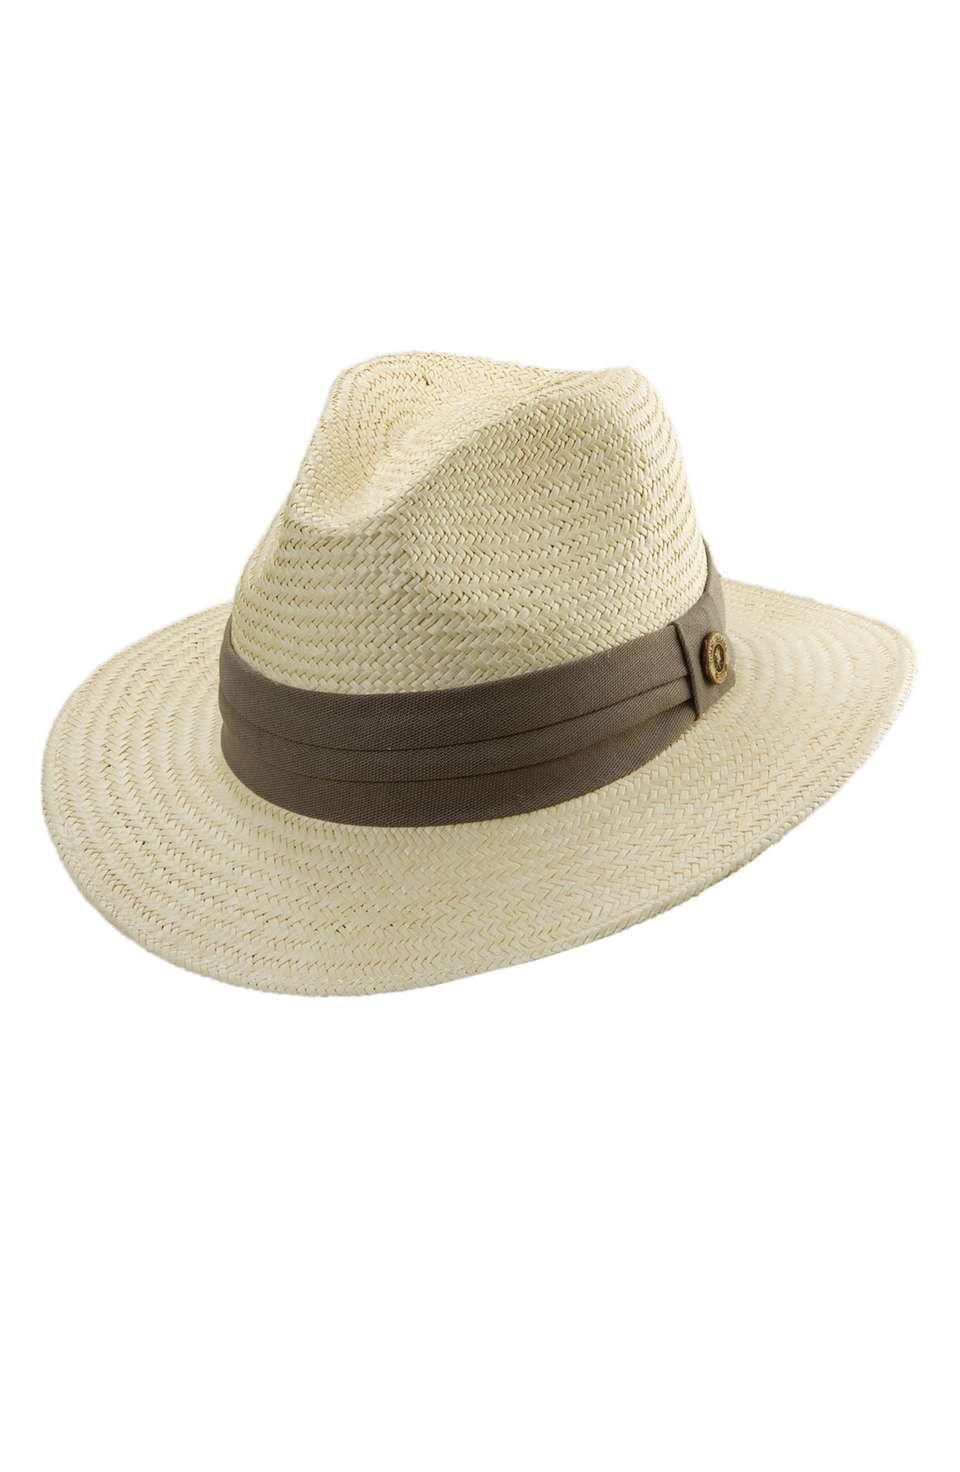 Tommy Bahama 'Golf' Palm Fiber Fedora   mens fedora hat   menswear   menswear   mens fashion   mens style   wantering http://www.wantering.com/mens-clothing-item/tommy-bahama-golf-palm-fiber-fedora/ag4HG/